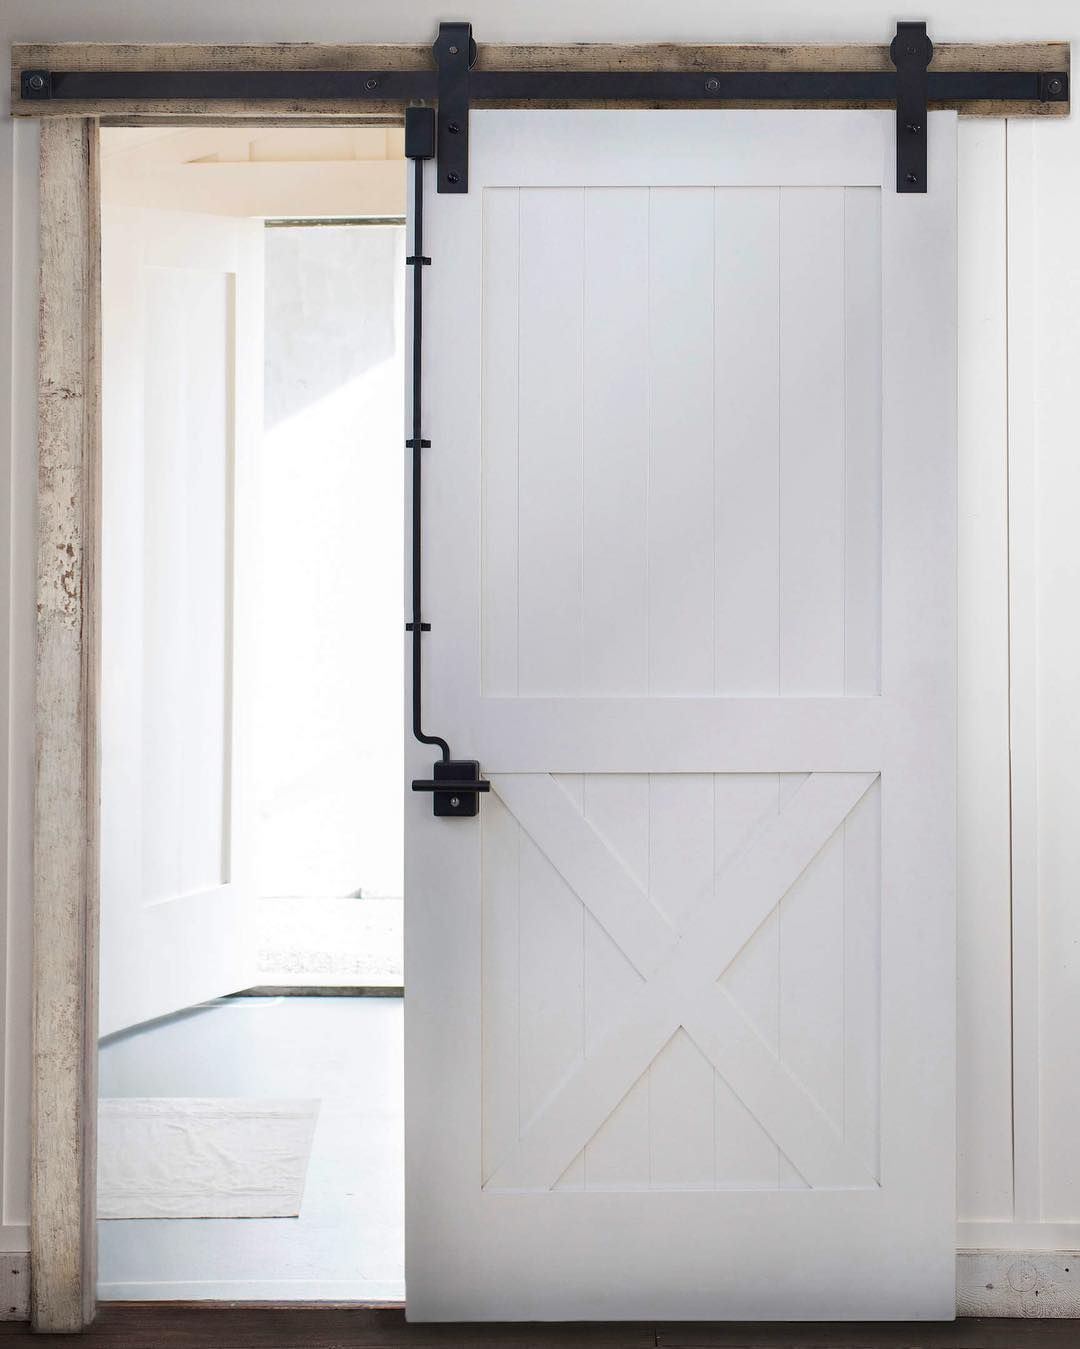 Introducing The Rustica Door Lock We Ve Pioneered The First Ever